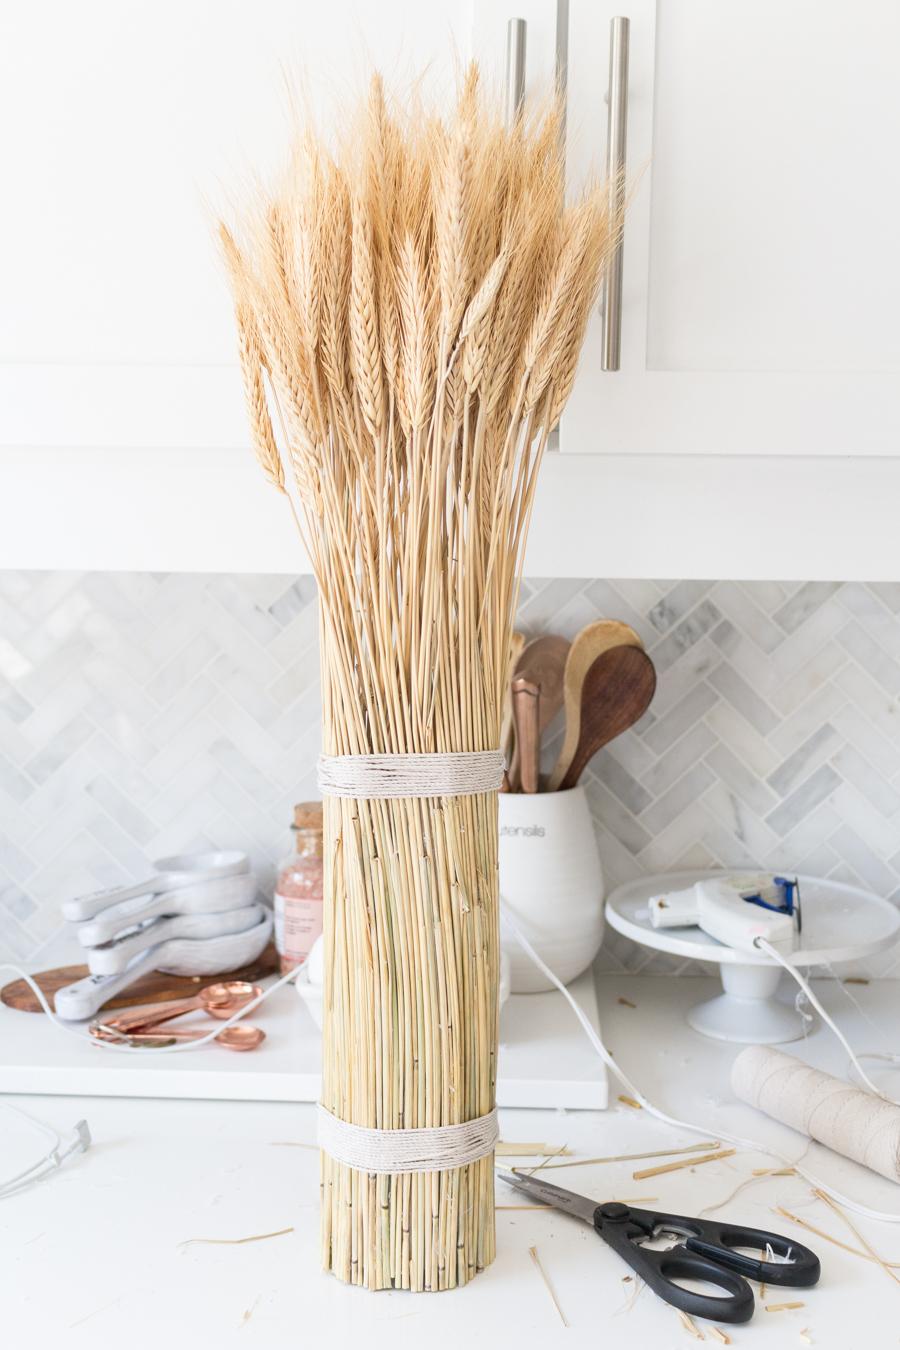 wheatbundlediycraftberrybush-7